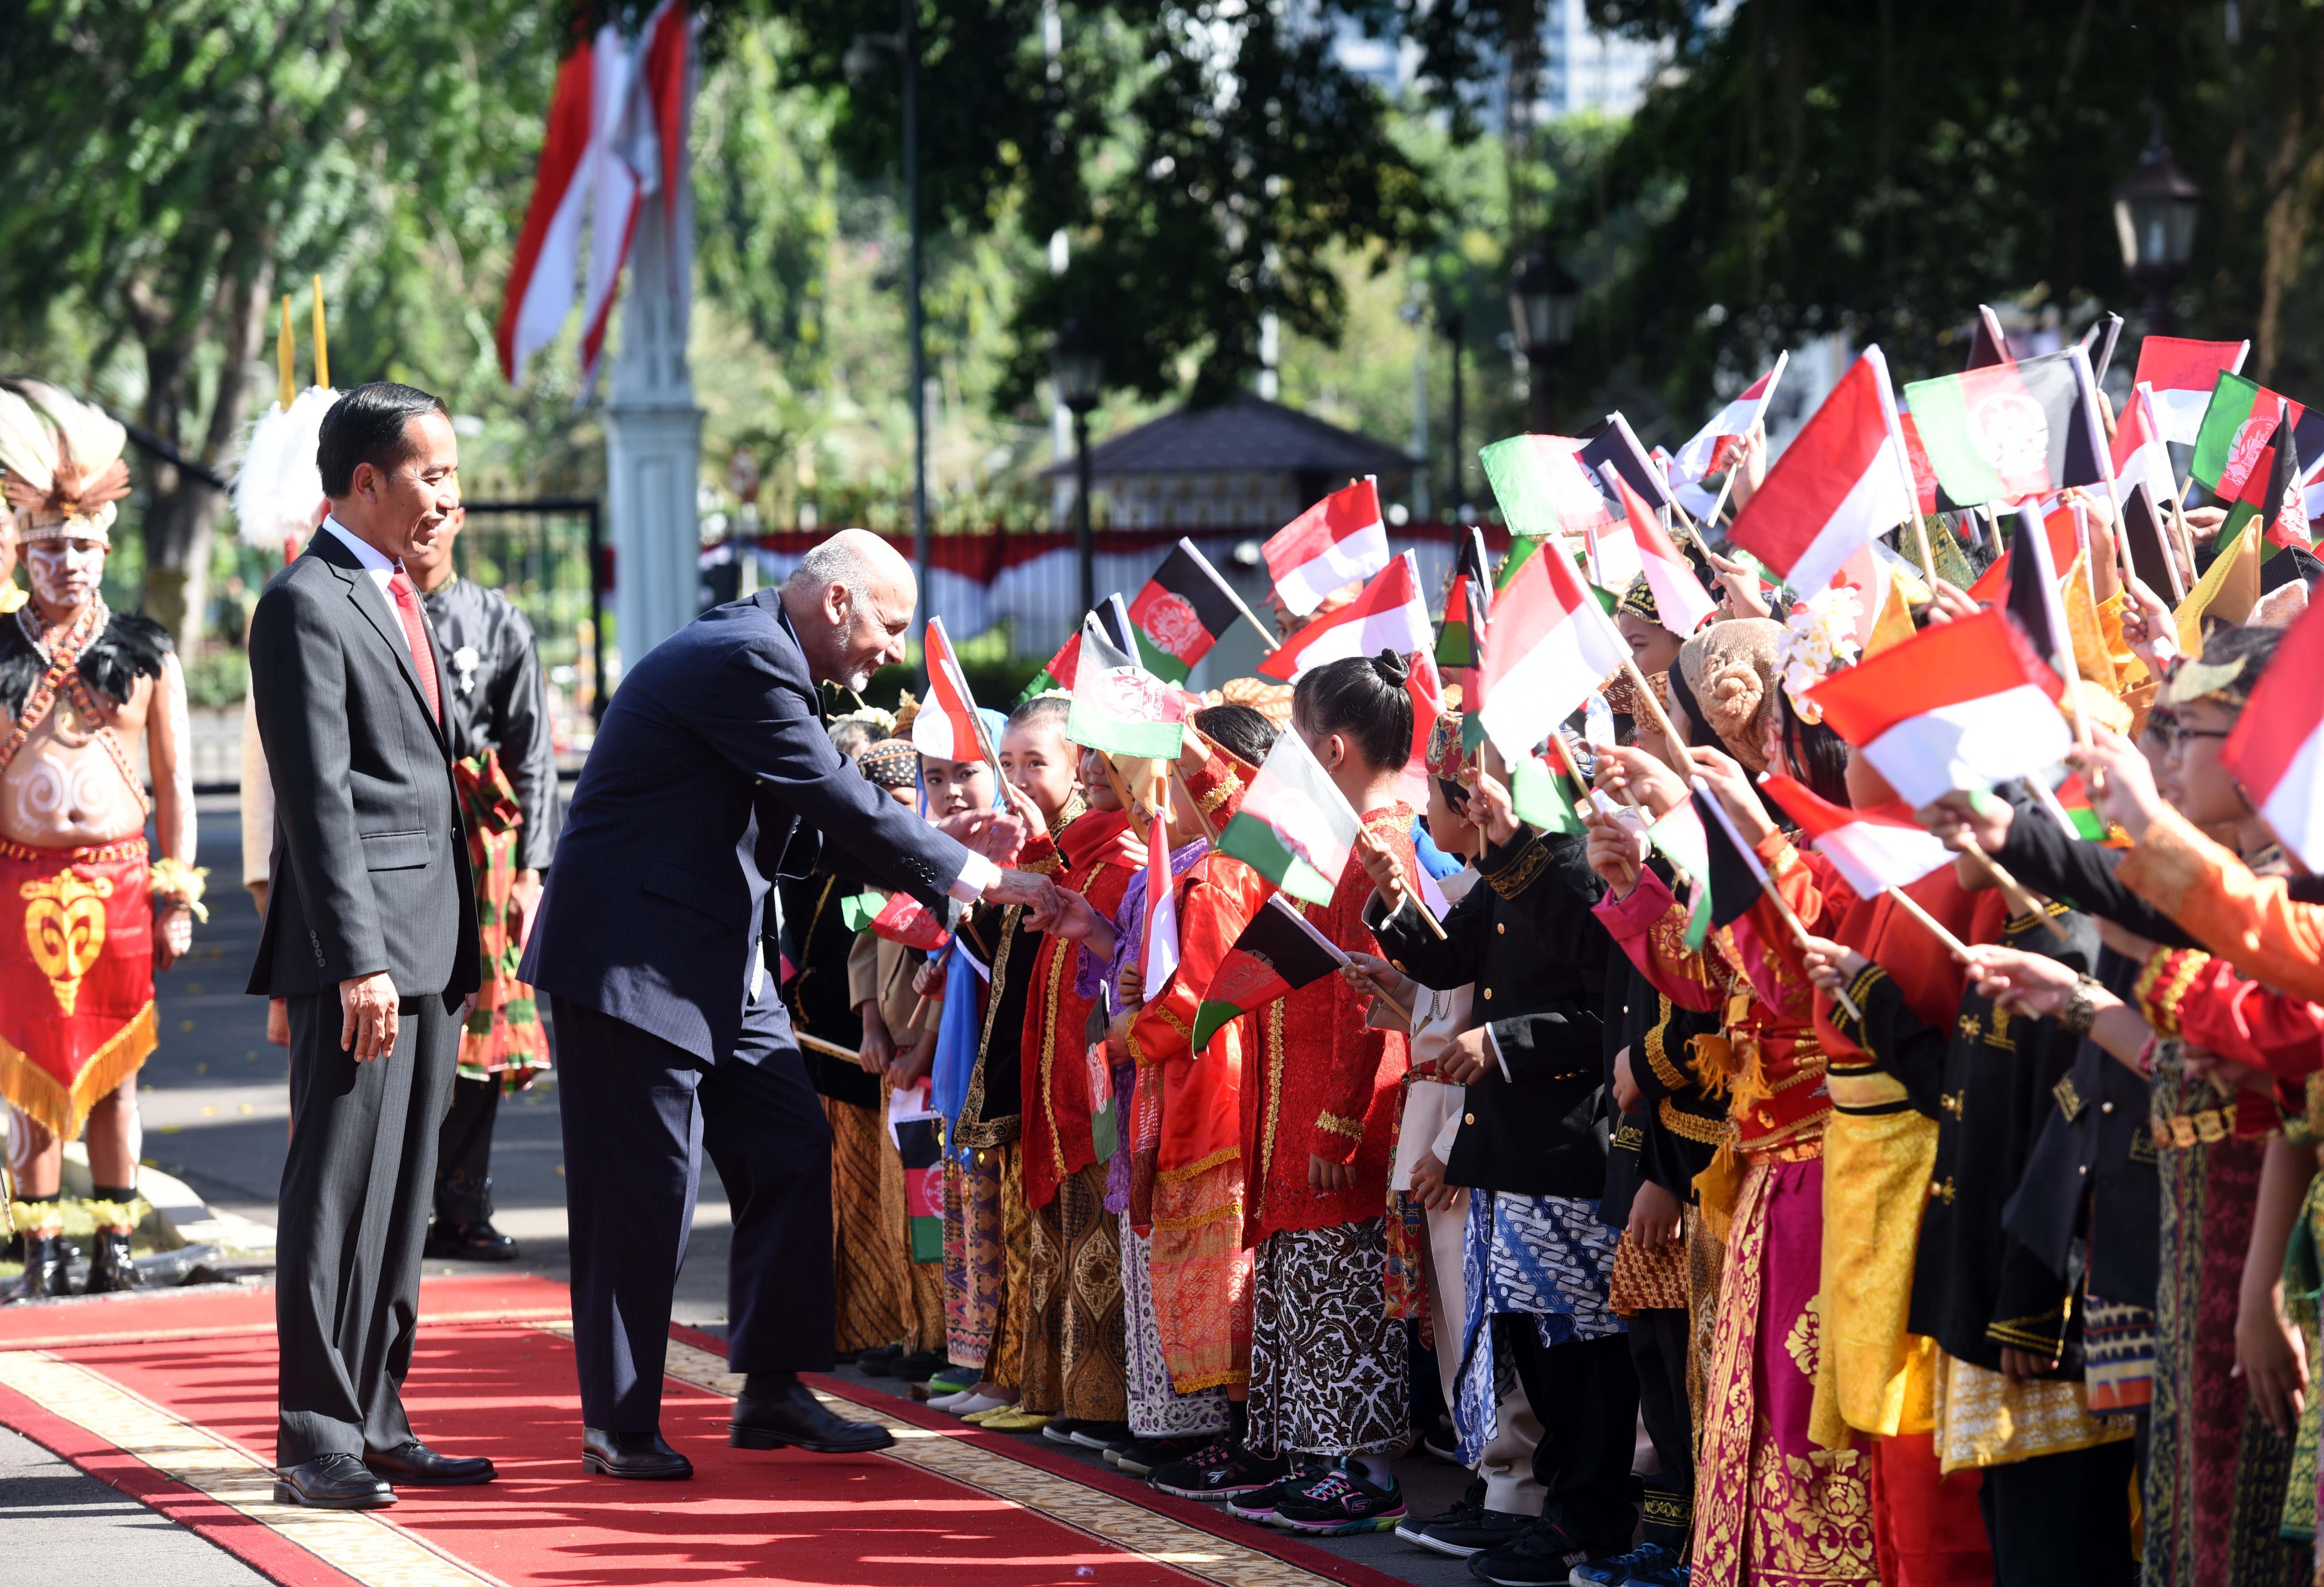 Presiden Afghanistan Mohammad Ashraf Ghani didampingi Presiden Jokowi menyalami anak-anak yang menyambut kedatangannya, di Istana Merdeka, Jakarta, Rabu (5/4) sore. (Foto: JAY/Humas)